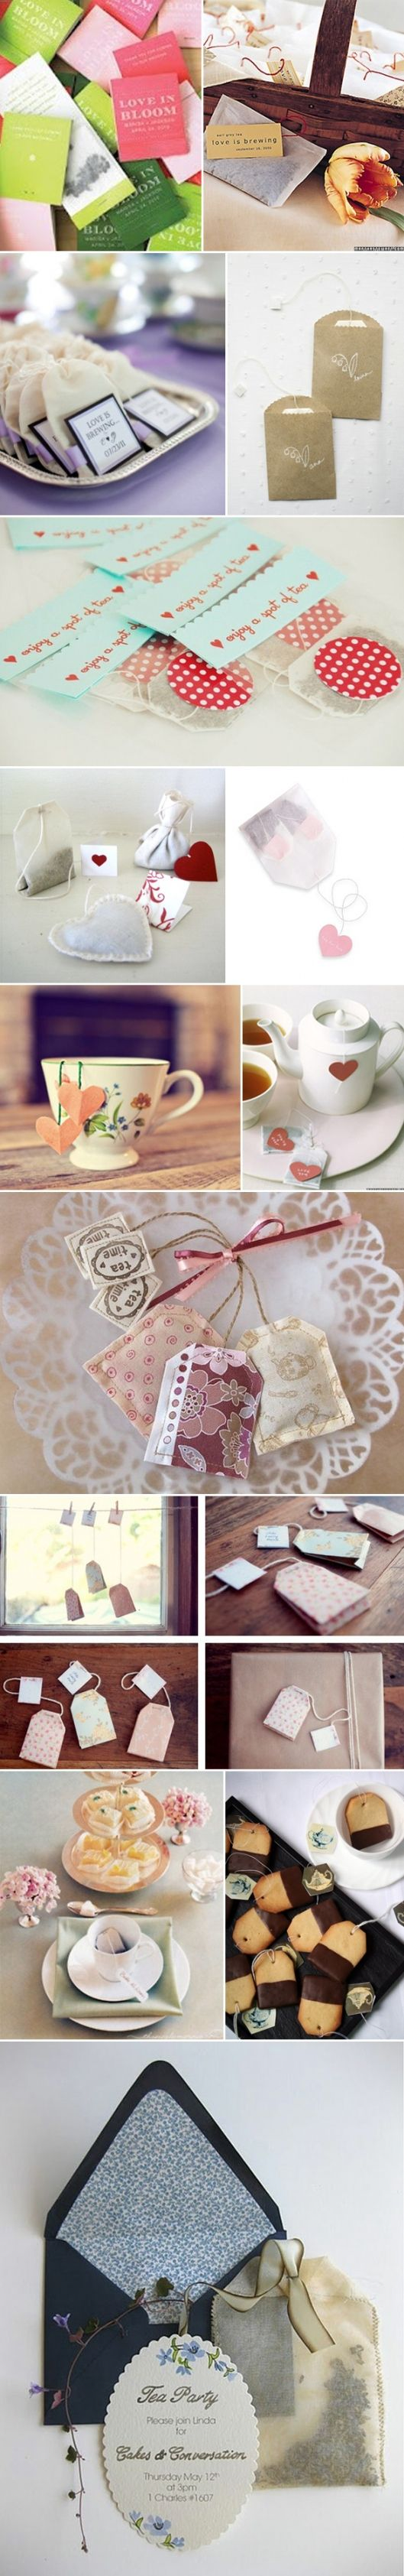 tea party ideas !